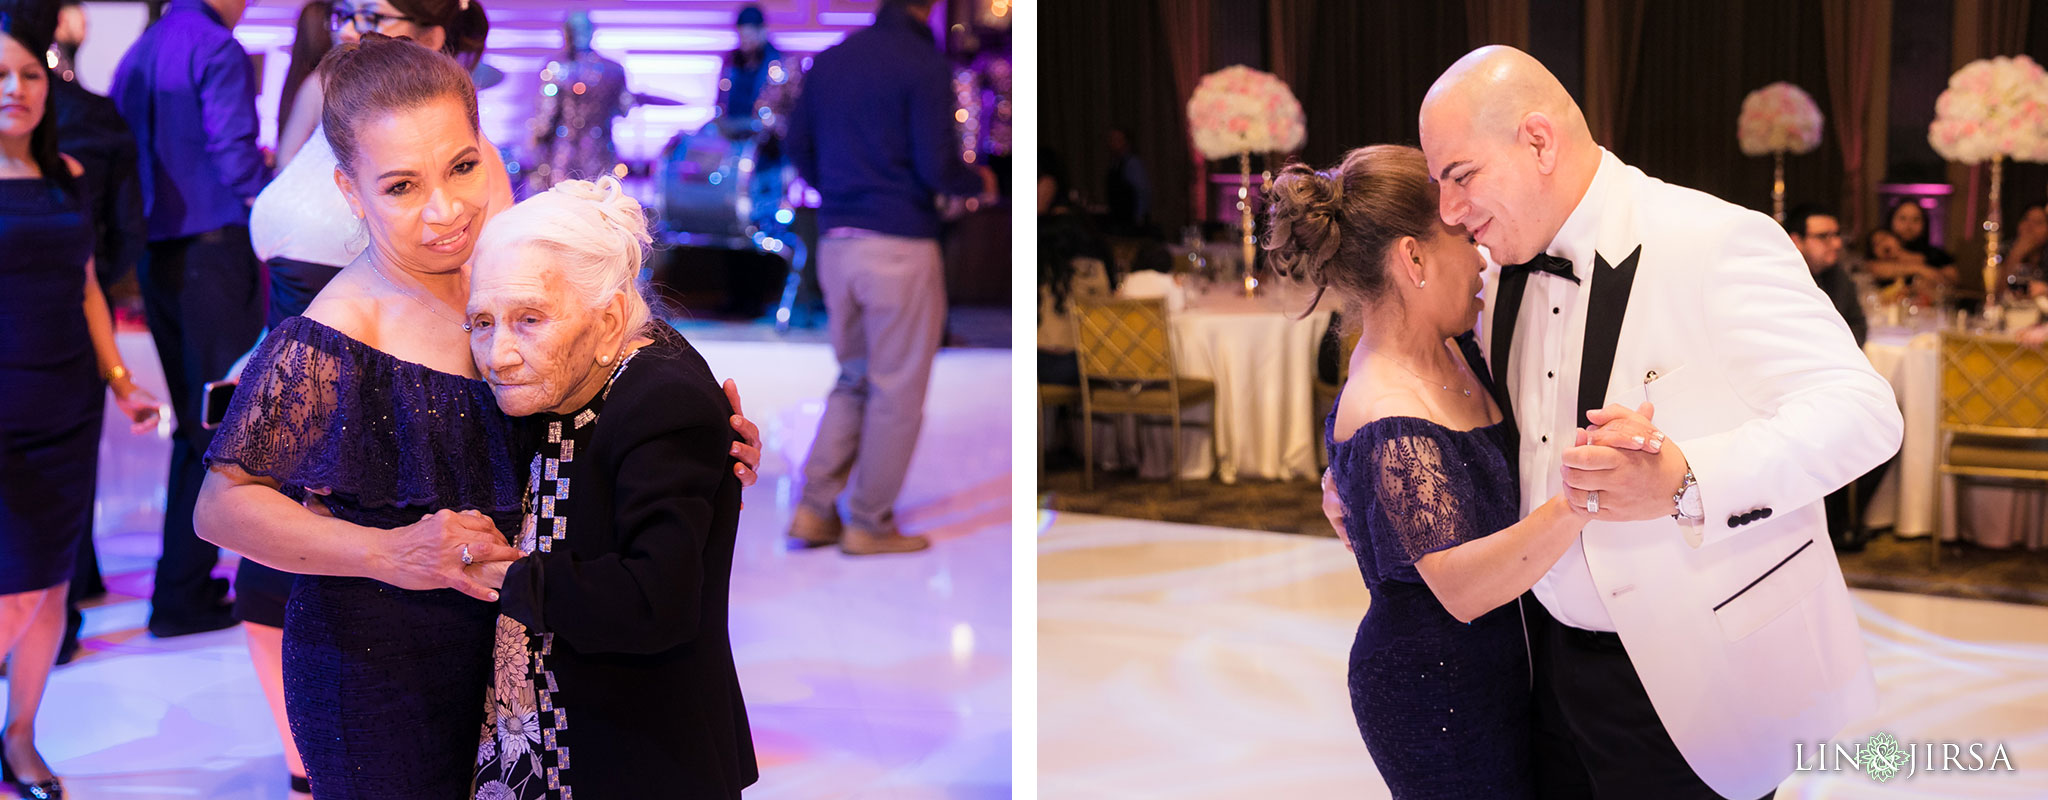 22 taglyan complex los angeles wedding photography